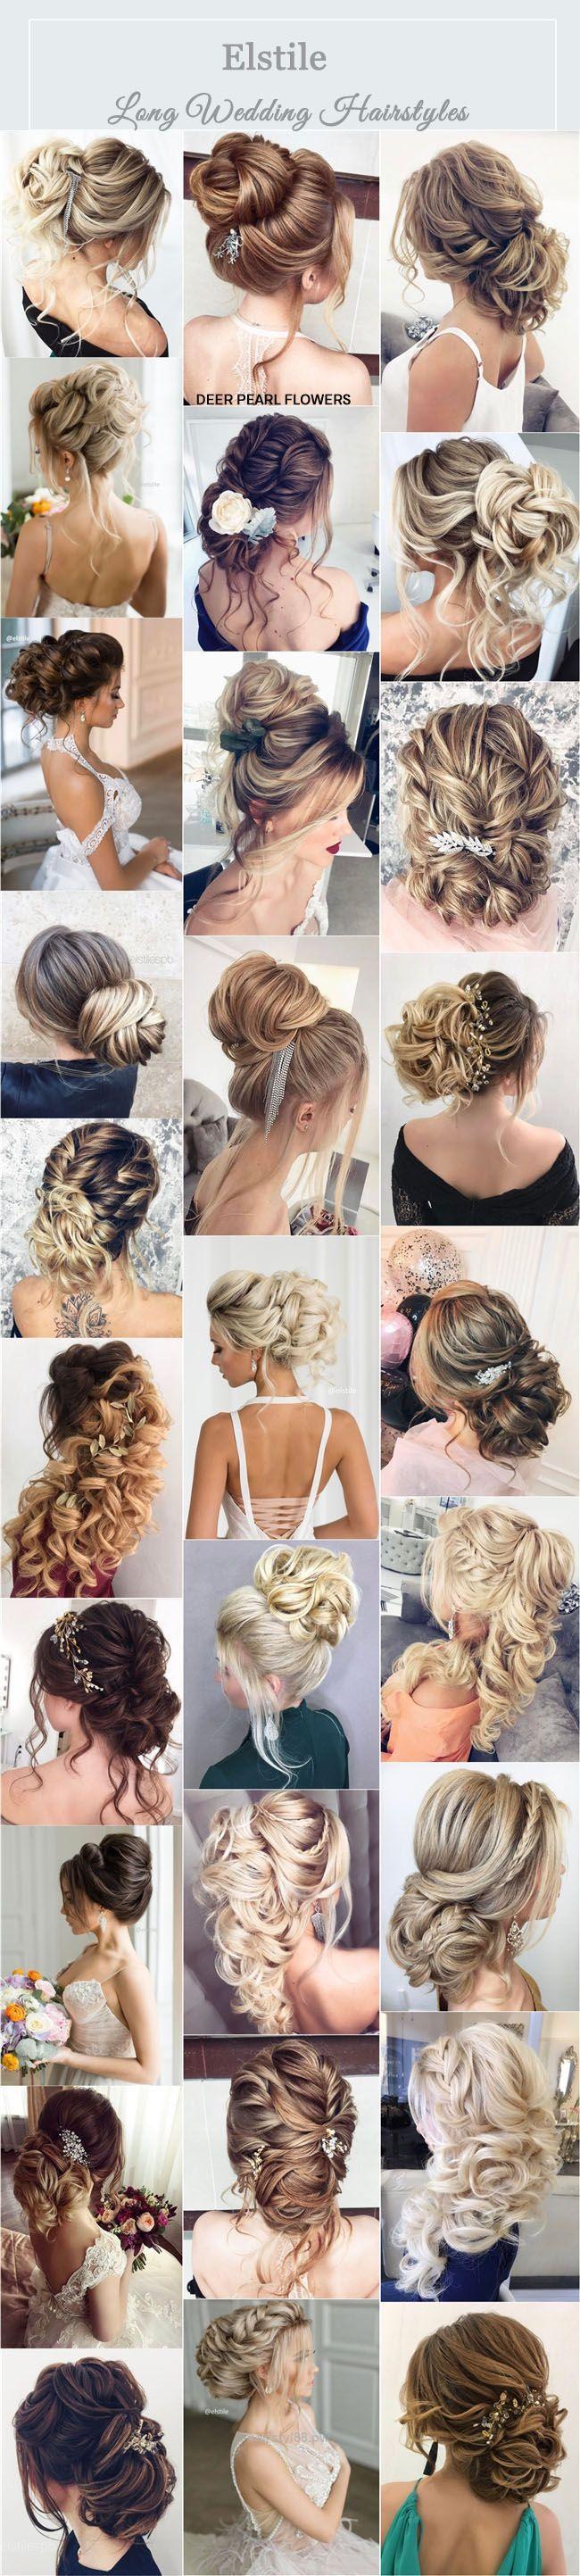 Insane Elstile Wedding Hairstyles & Updos for Long Hair / www.deerpearlflow…  The post  Elstile Wedding Hairstyles & Updos for Long Hair / www.deerpearlflow……  appeared first on  88 Haircuts .